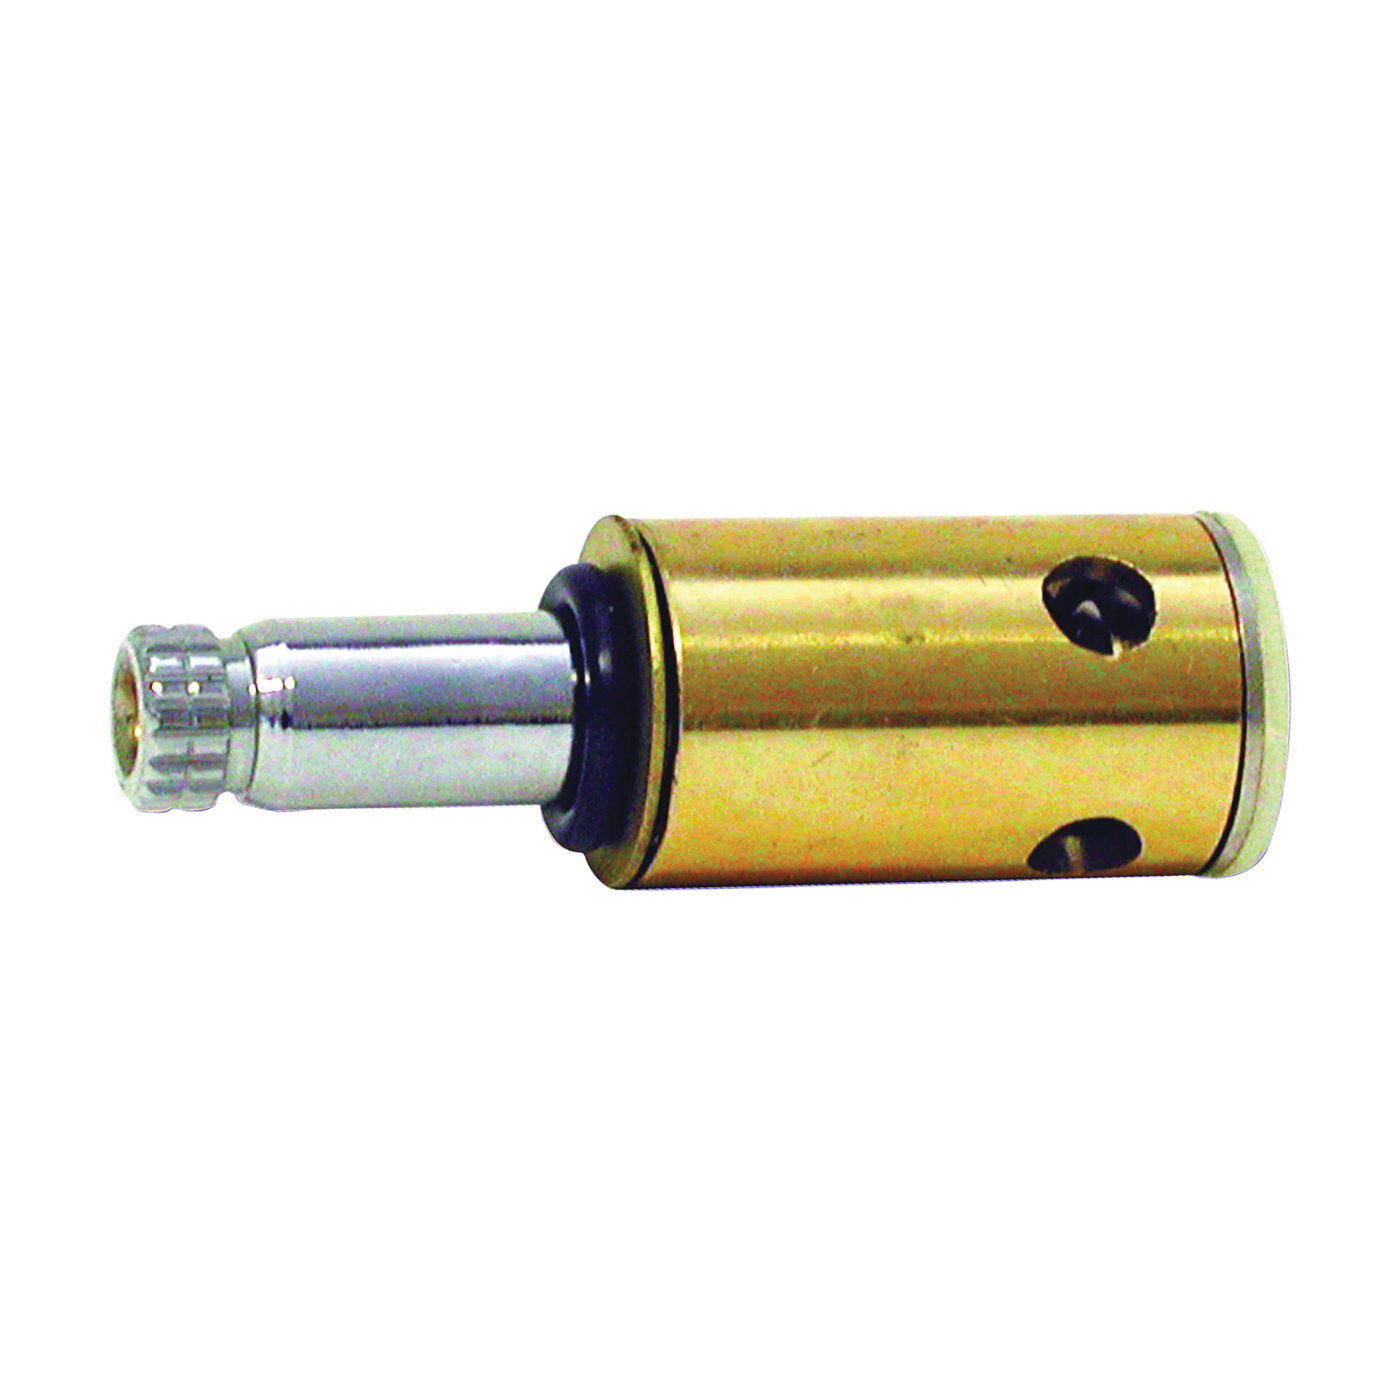 Picture of Danco 15559E Faucet Stem, Brass, Brass, 1-23/32 in L